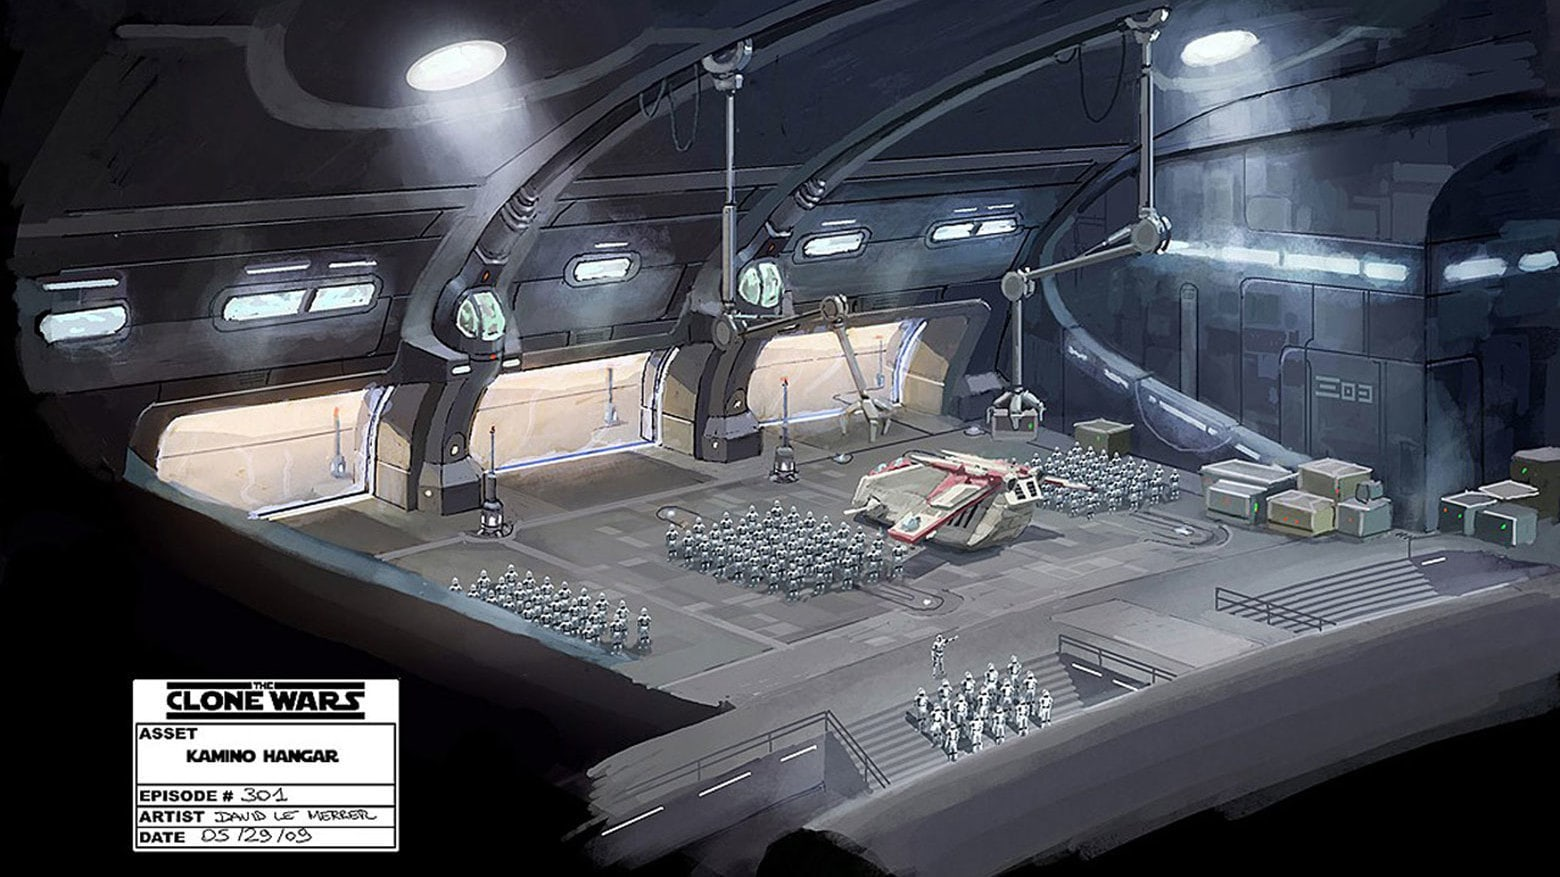 star wars clonetrooper concept - photo #37